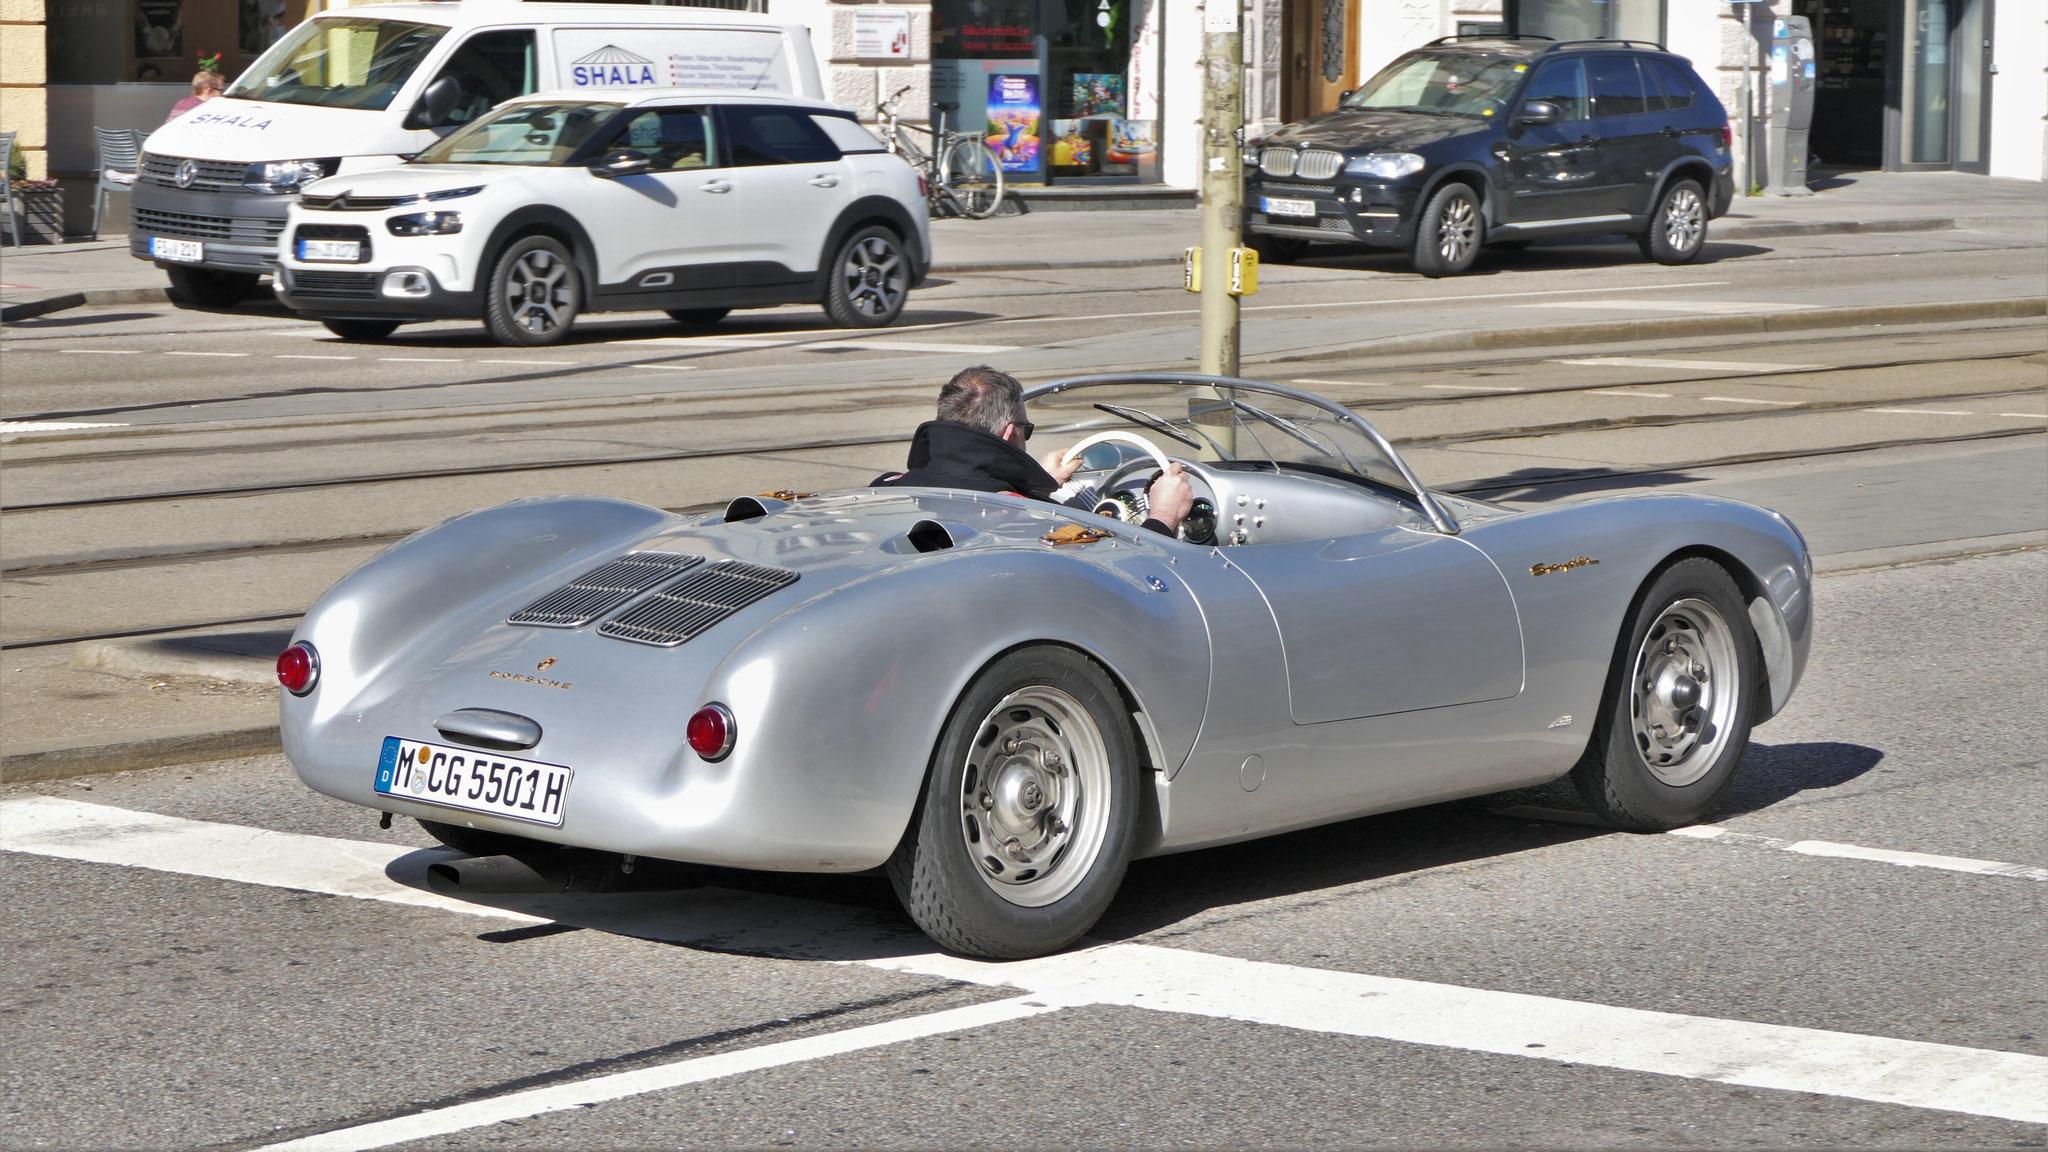 Porsche 550 Spyder - M-CG-5501H